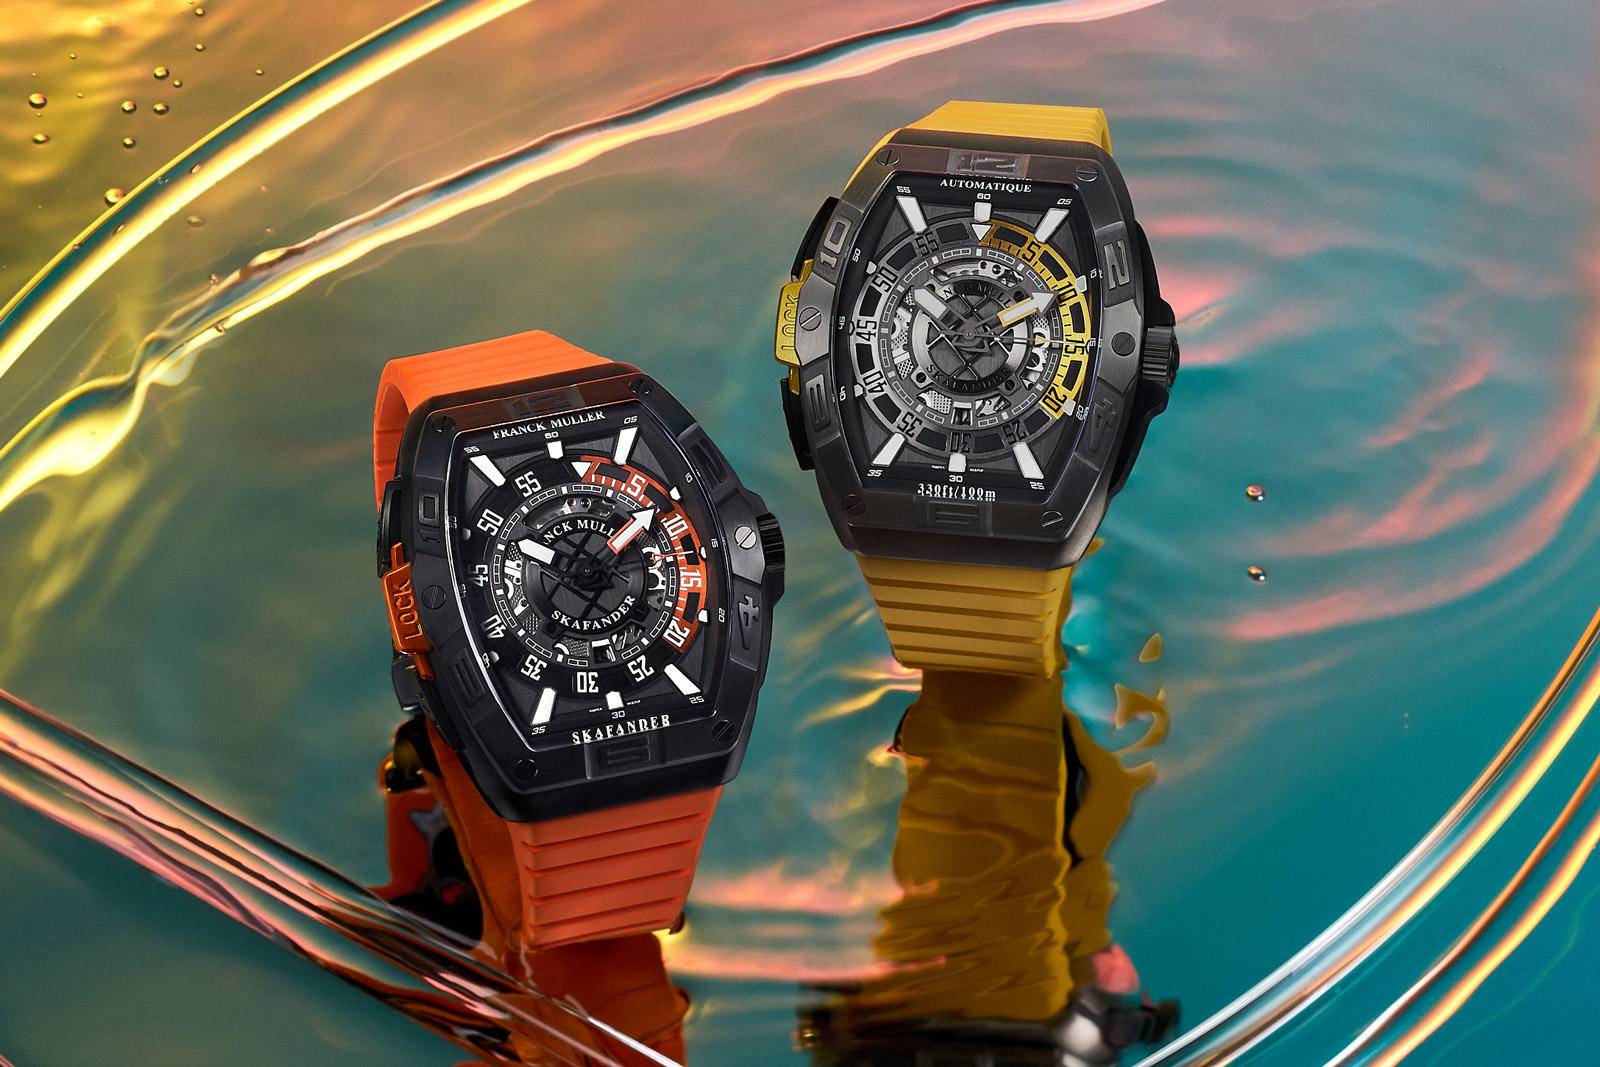 Franck Muller Introduces the Skafander Tonneau Diver's Watch